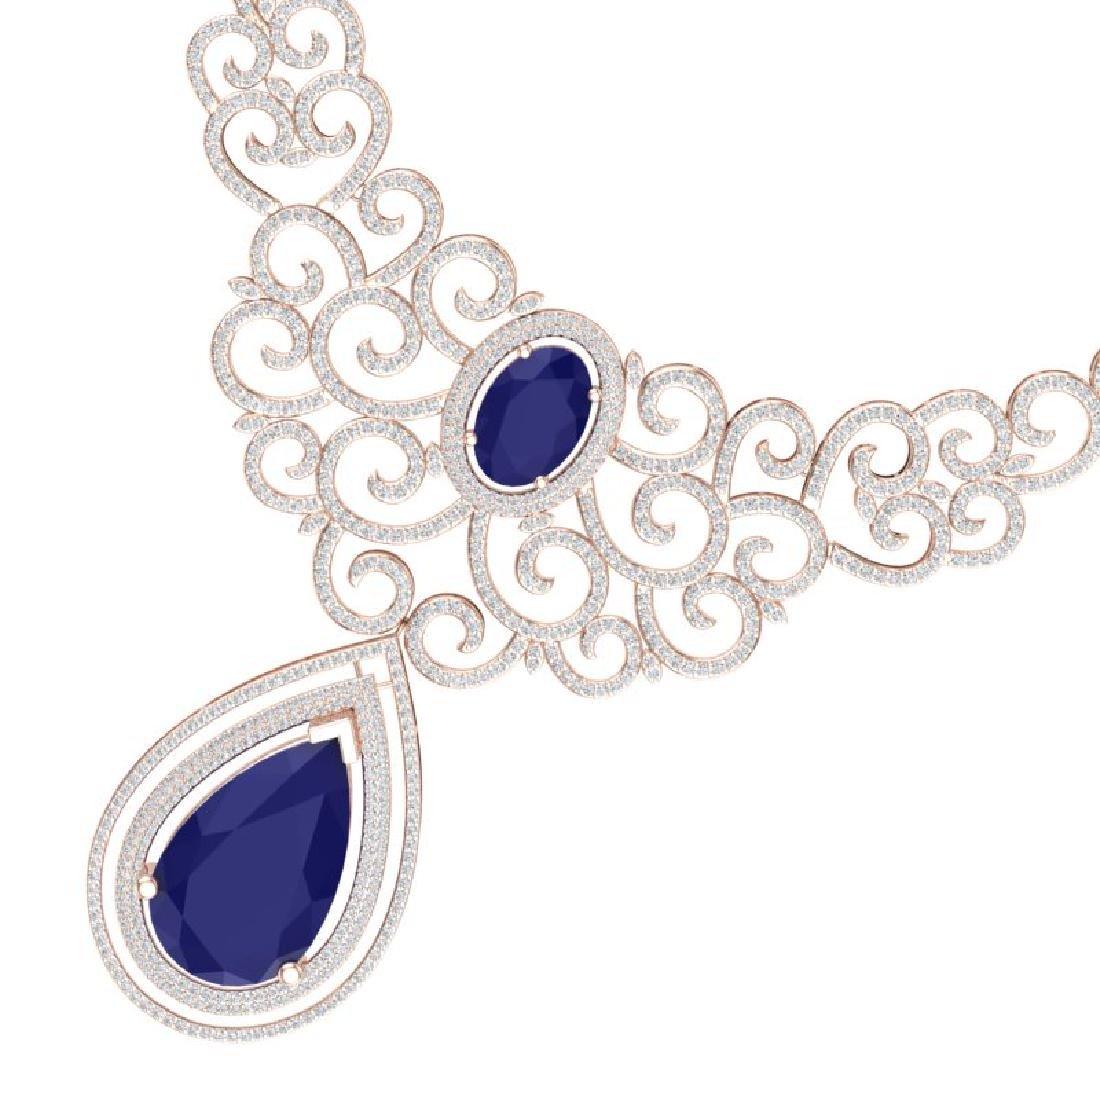 87.52 CTW Royalty Sapphire & VS Diamond Necklace 18K